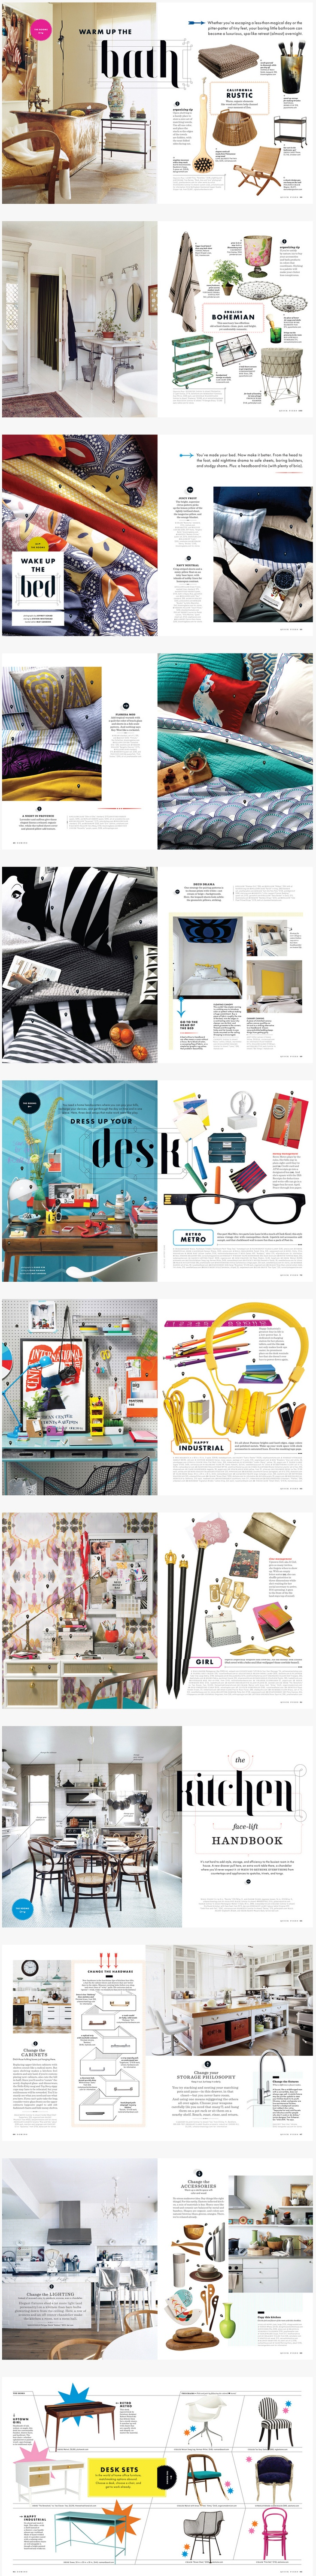 design by Claudia de Almeida // art director at Wired